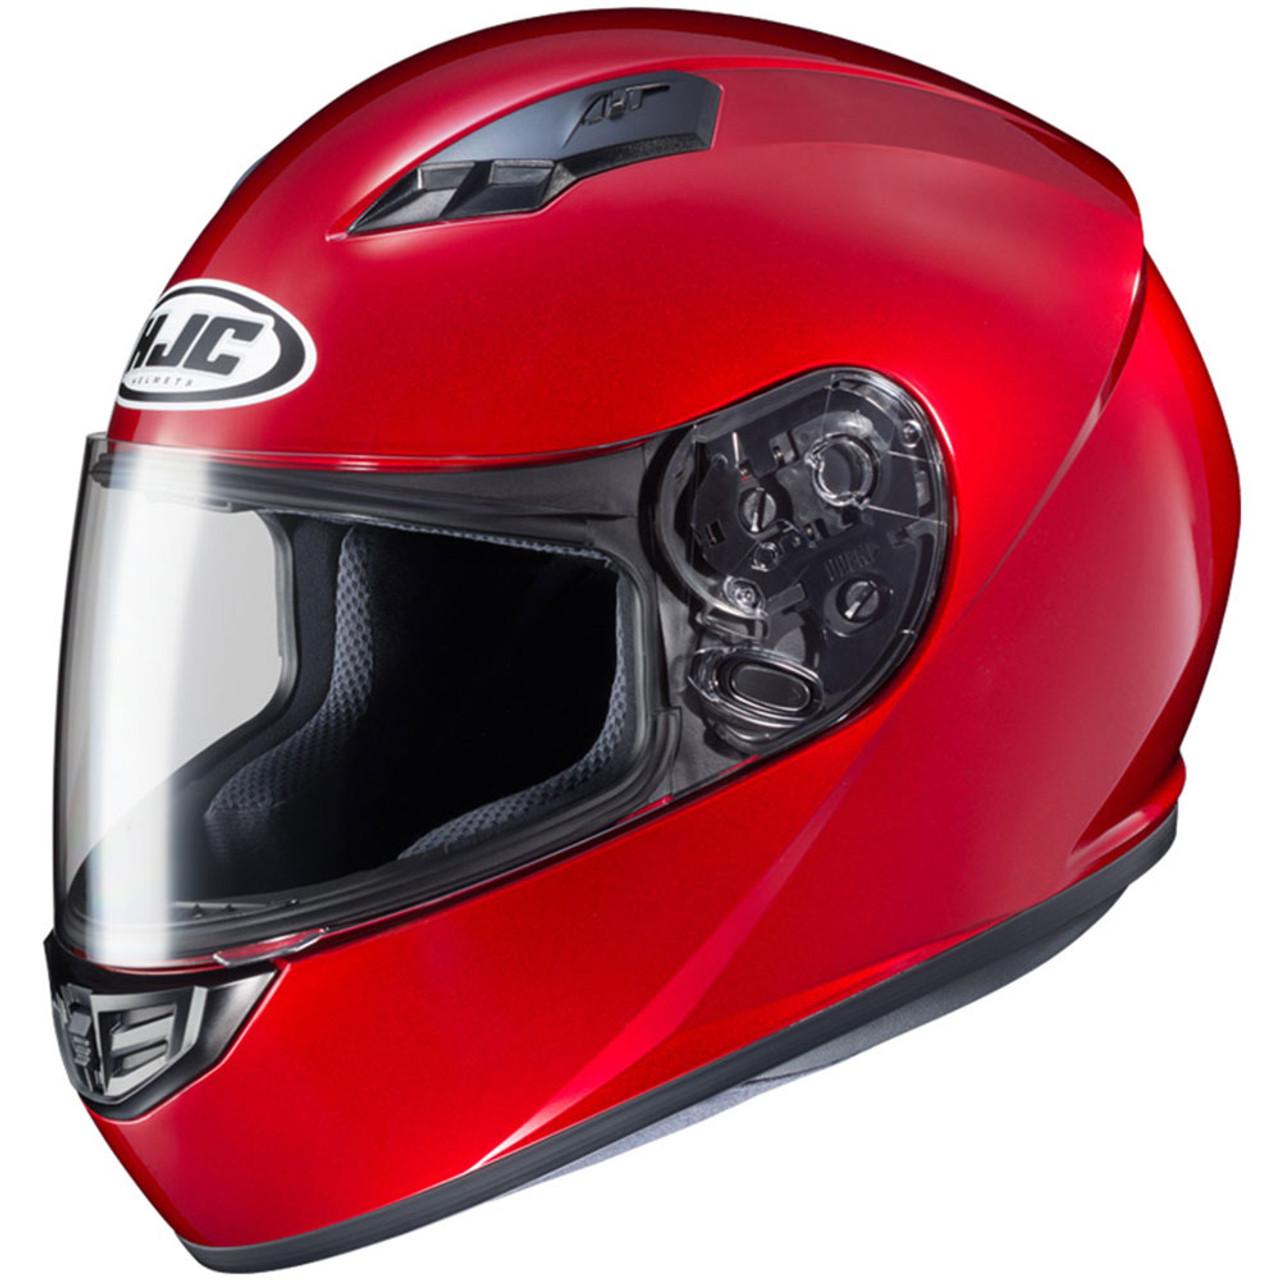 af8c5511 HJC CS-R3 Candy Red Helmet - Get Lowered Cycles